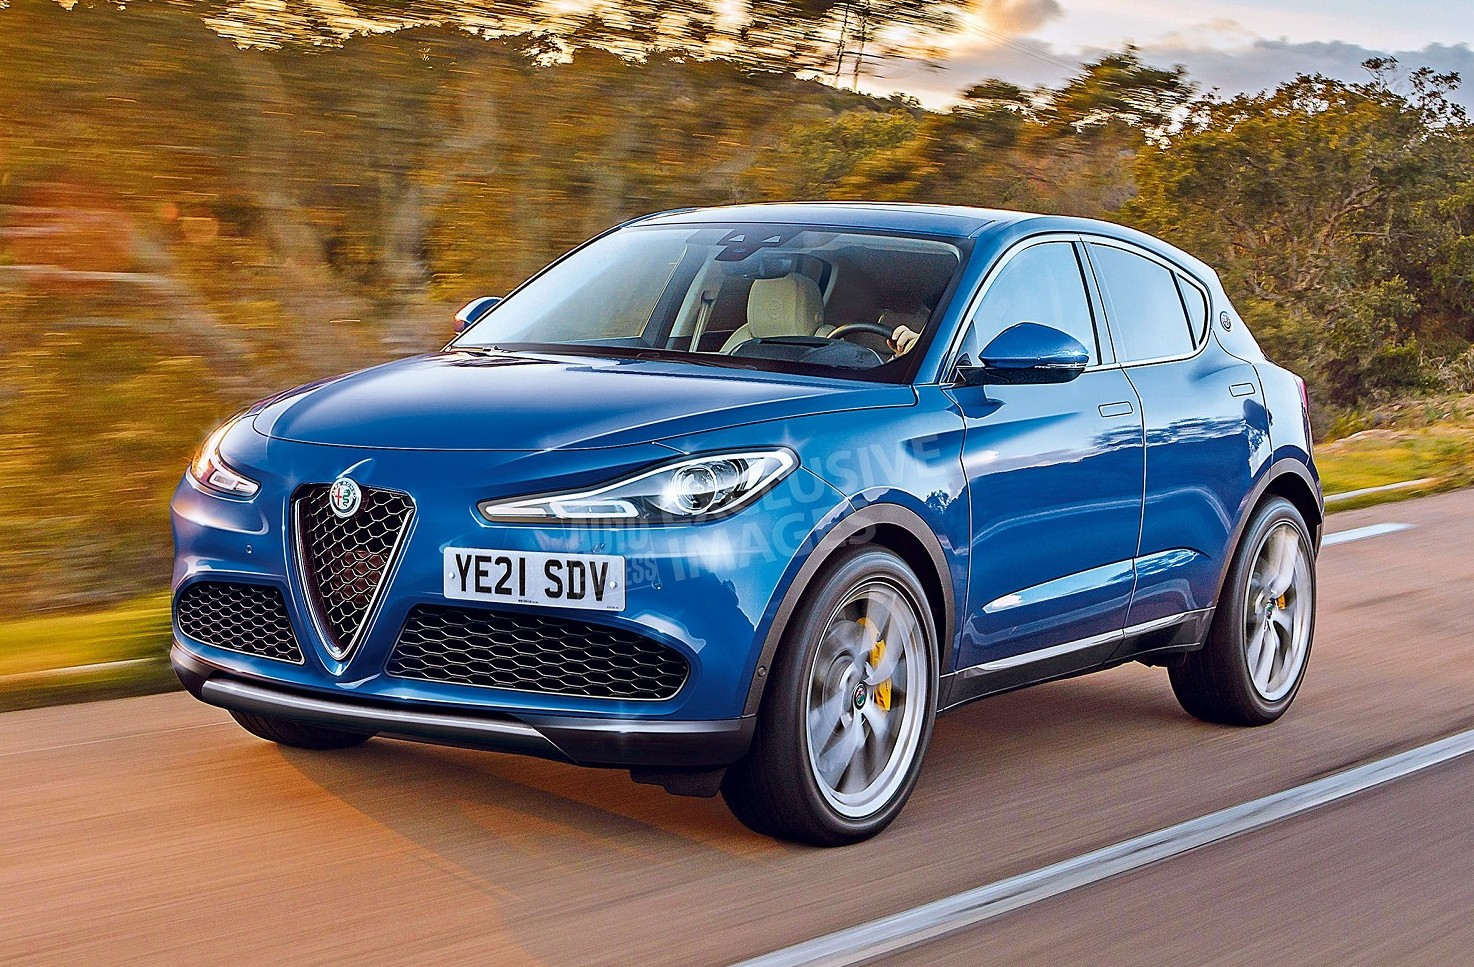 Alfa Romeo Stelvio 2019-2020 nuovo model